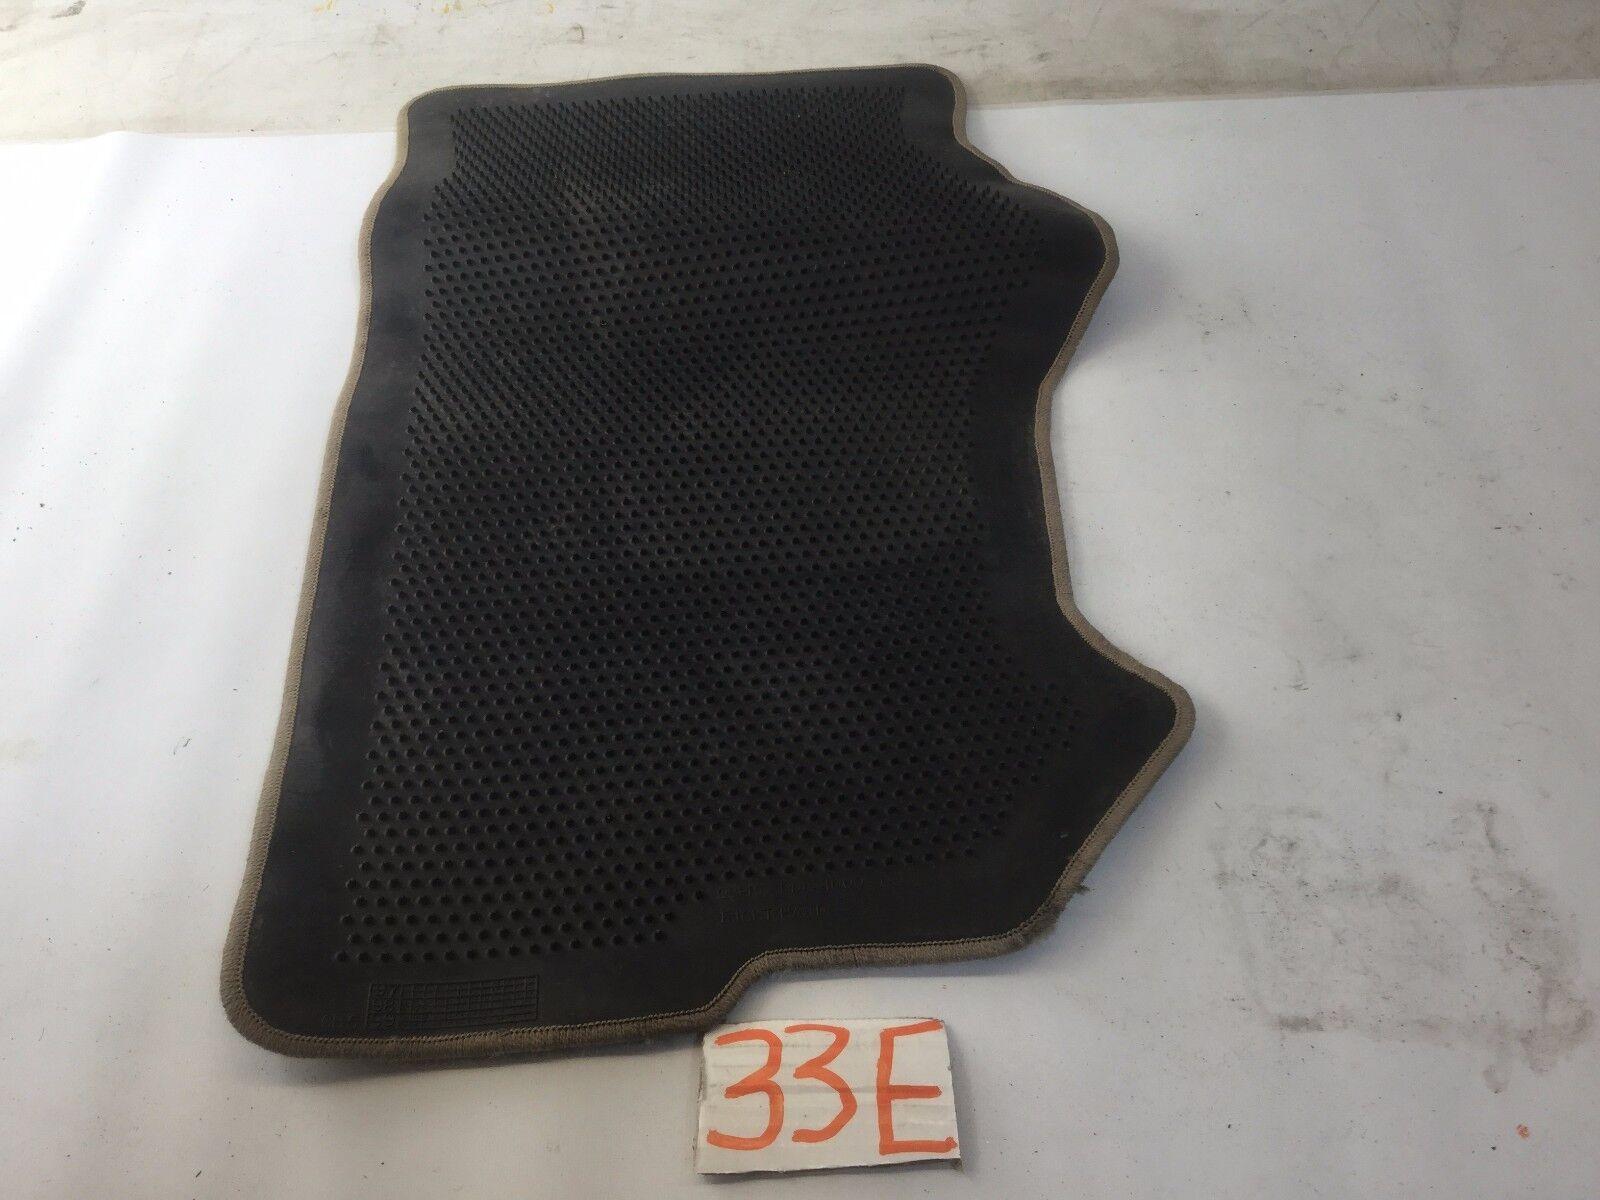 itm stripe tailored honda ebay image mats is civic cube loading car red